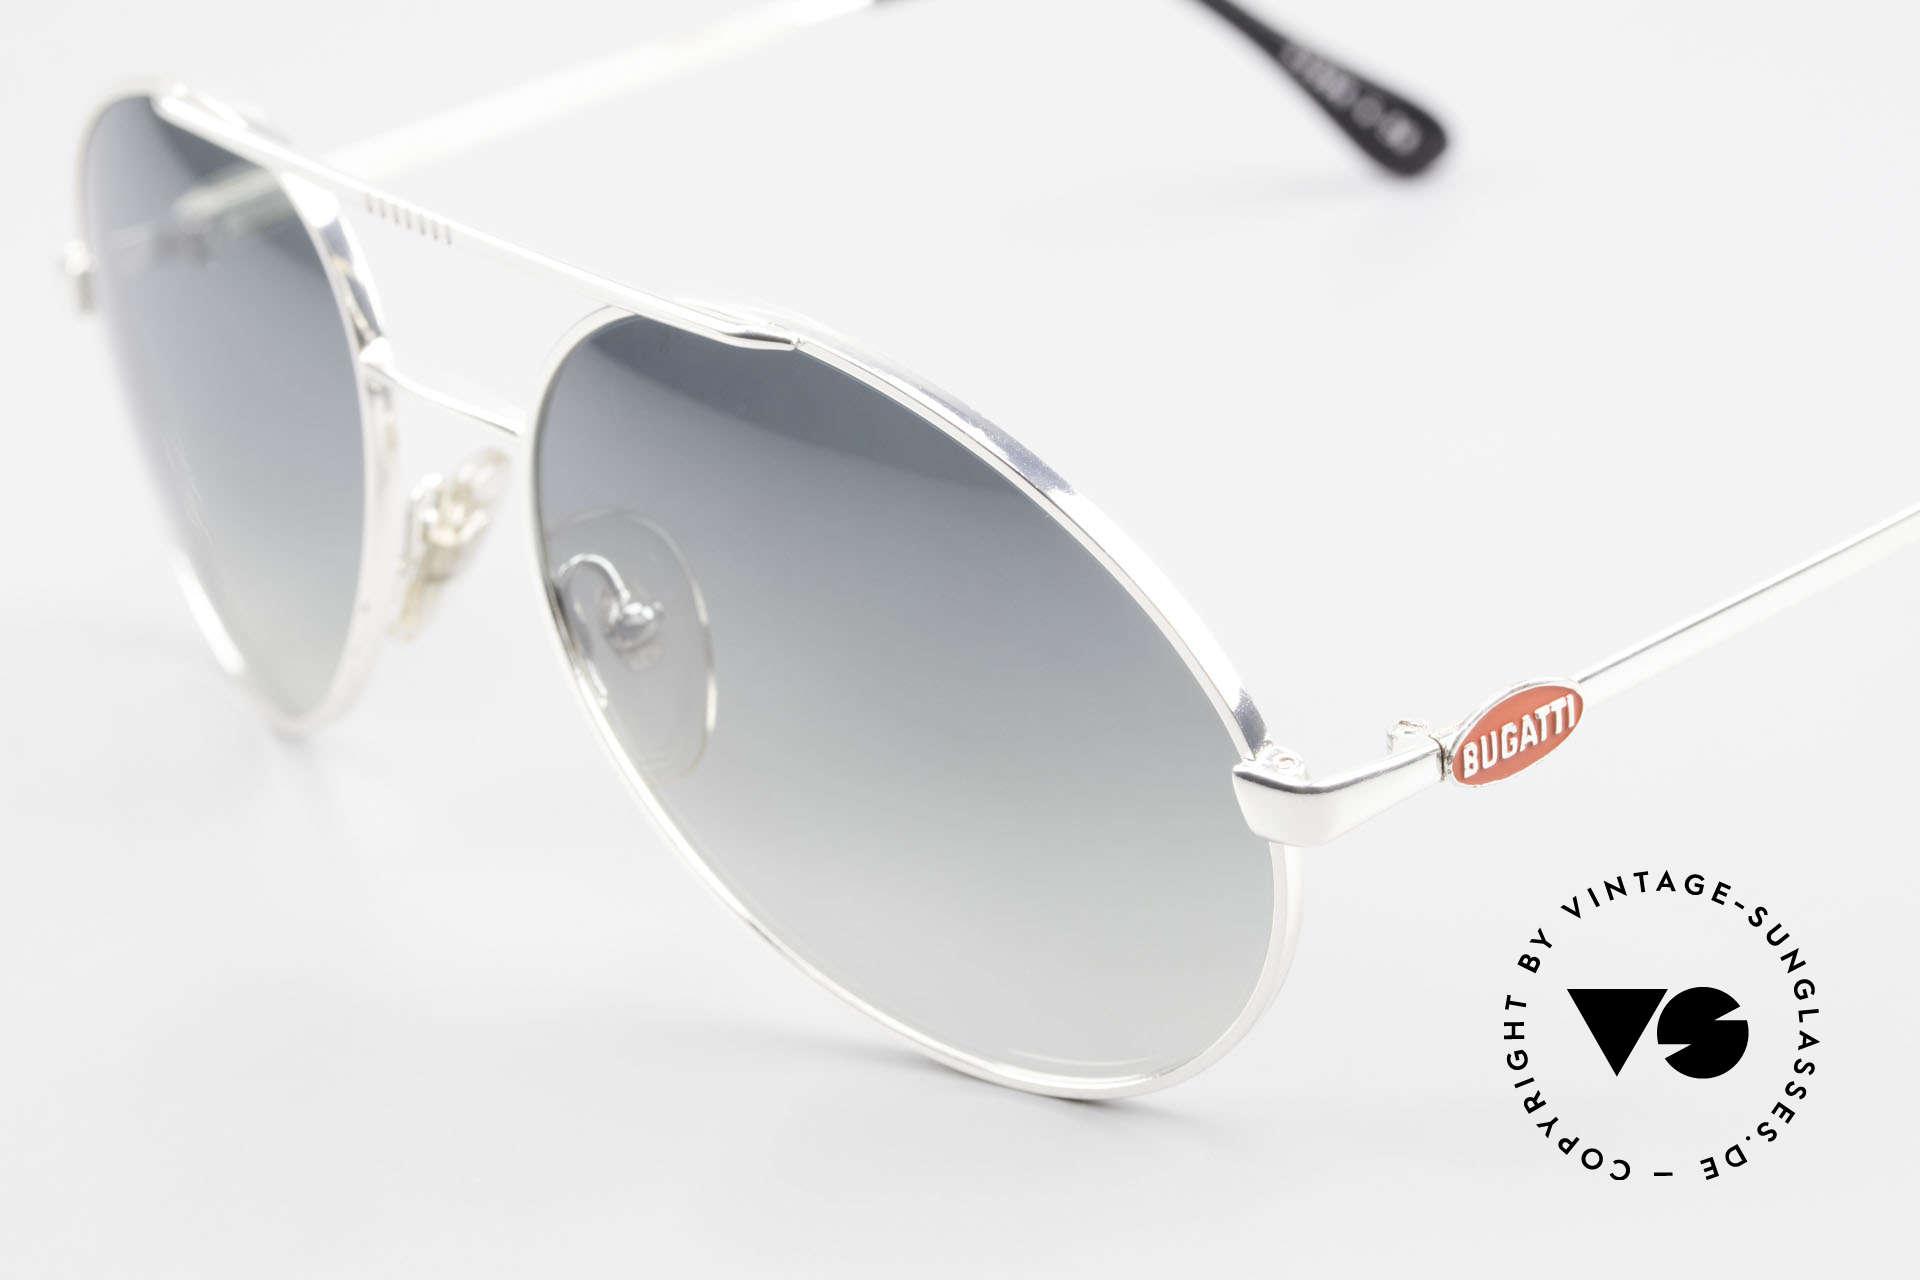 Bugatti 65996 Costly Mirrored Sun Lenses, silver frame with red Bugatti logos in L size 56, Made for Men